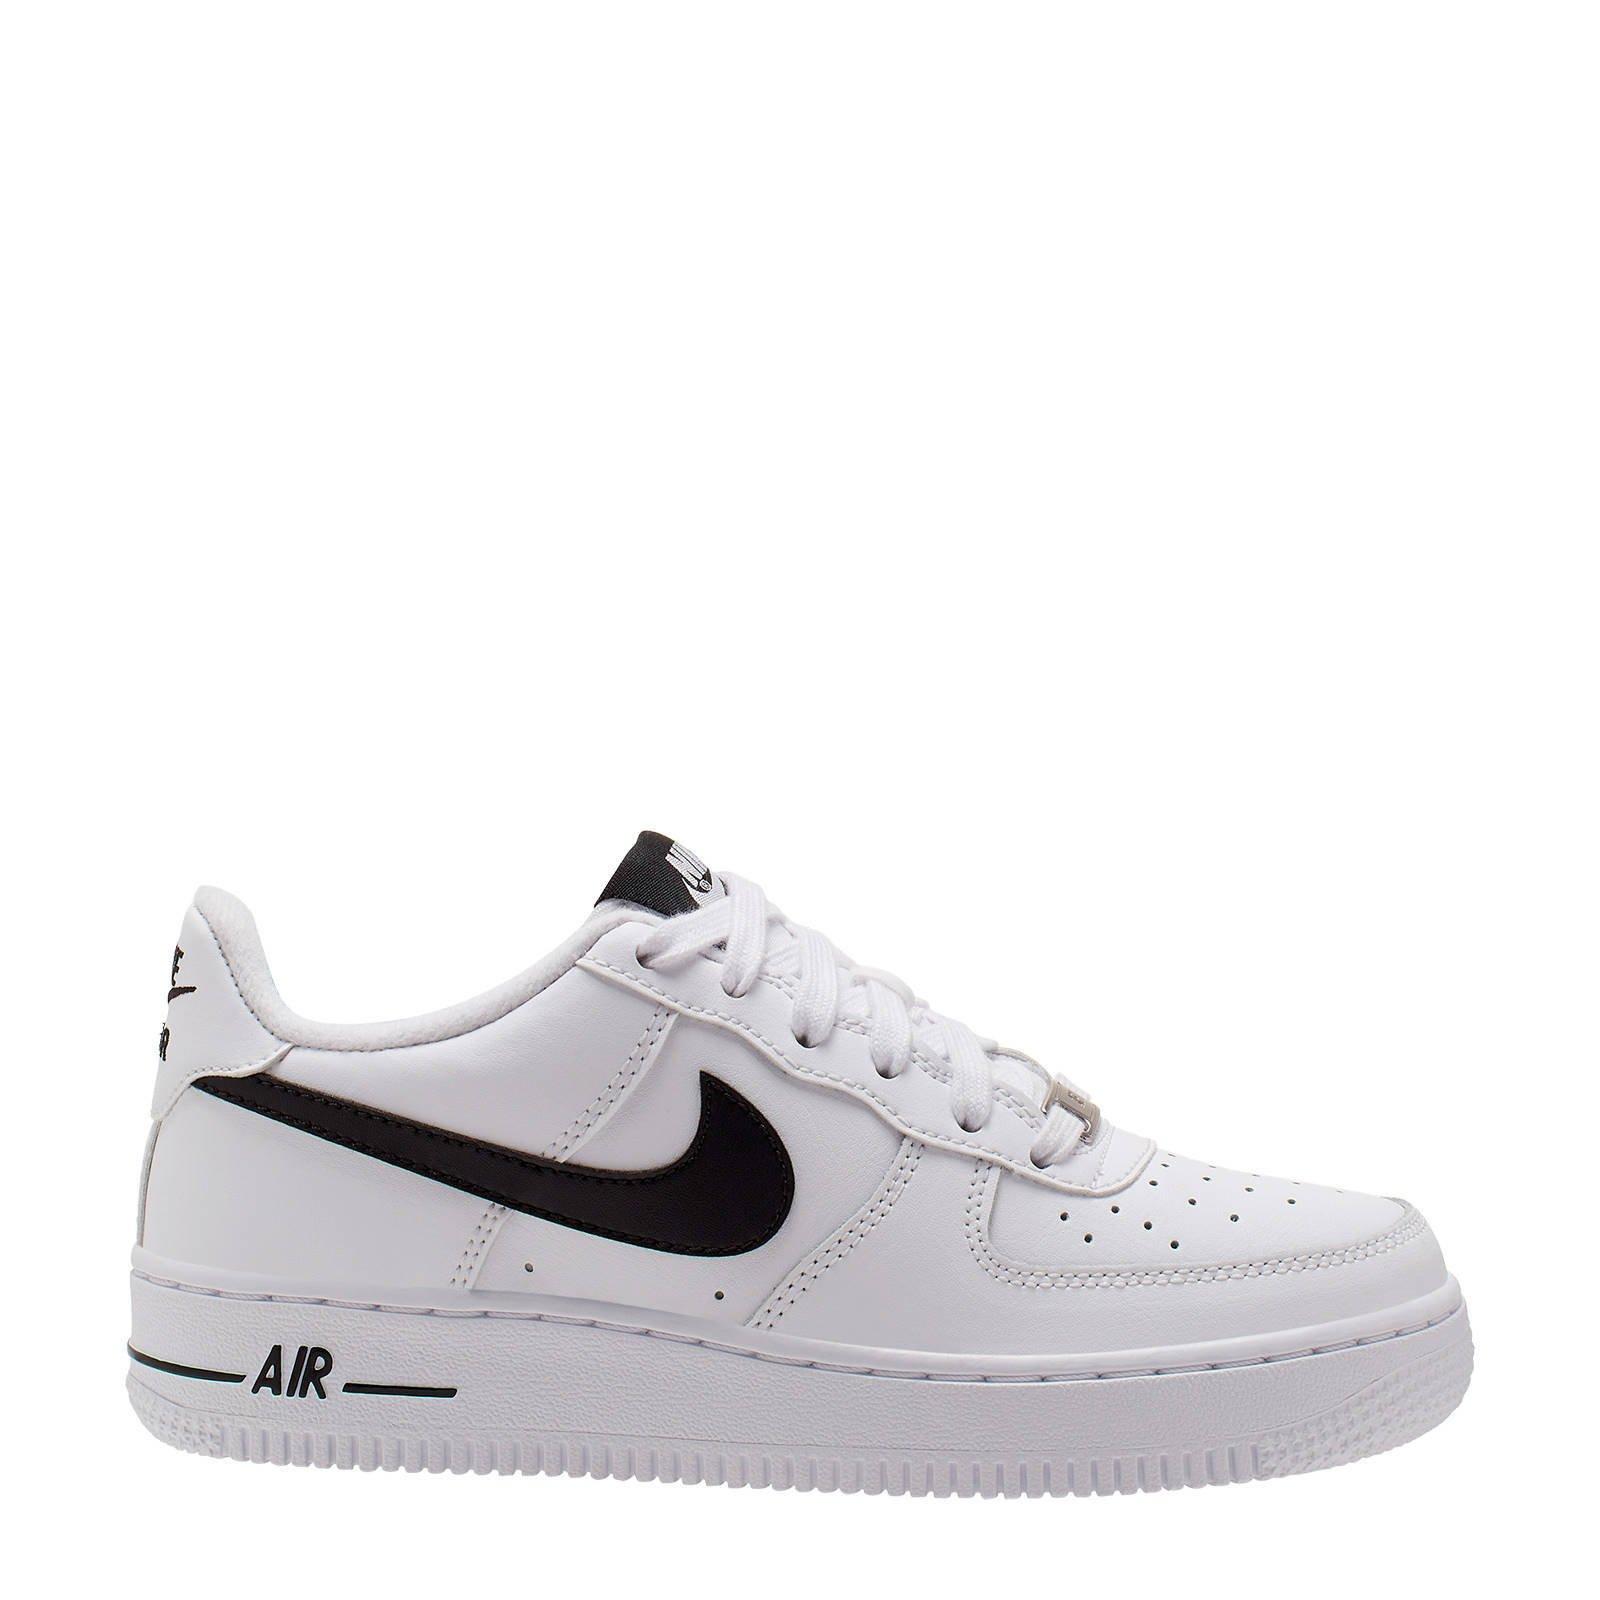 Nike Air Force 1 AN20 gs sneakers witzwart | wehkamp